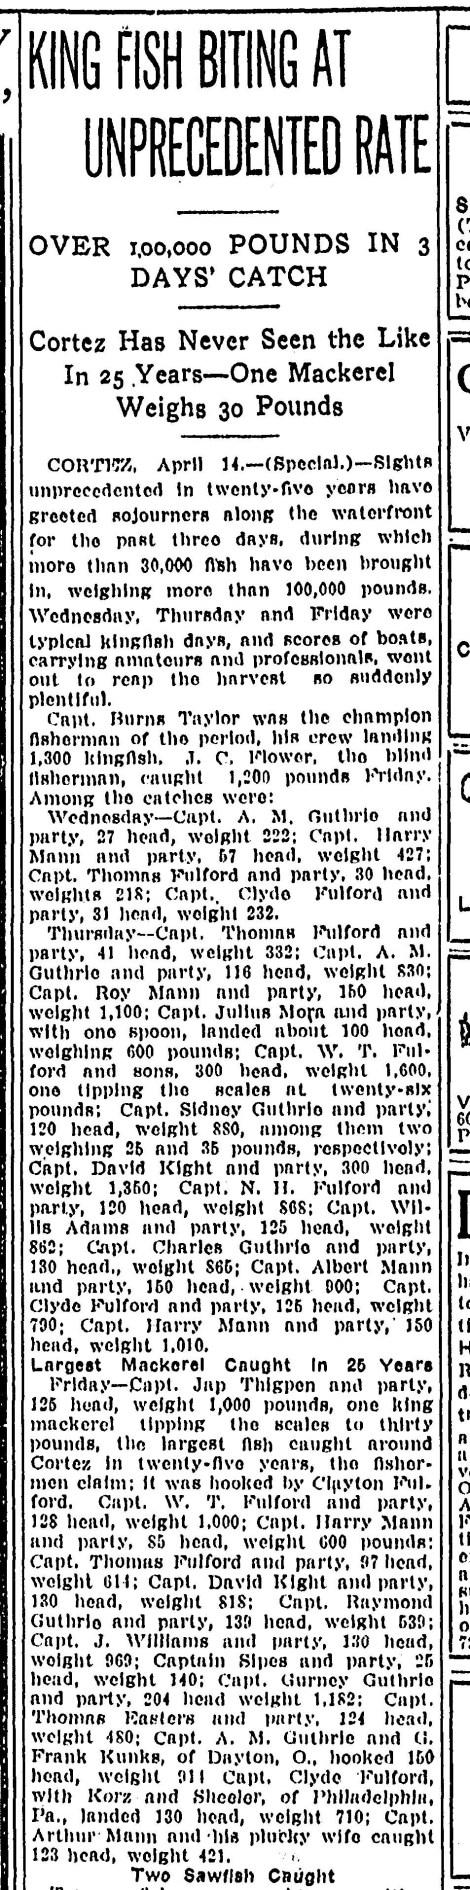 Tampa Tribune - Sunday, April 16, 1916 web